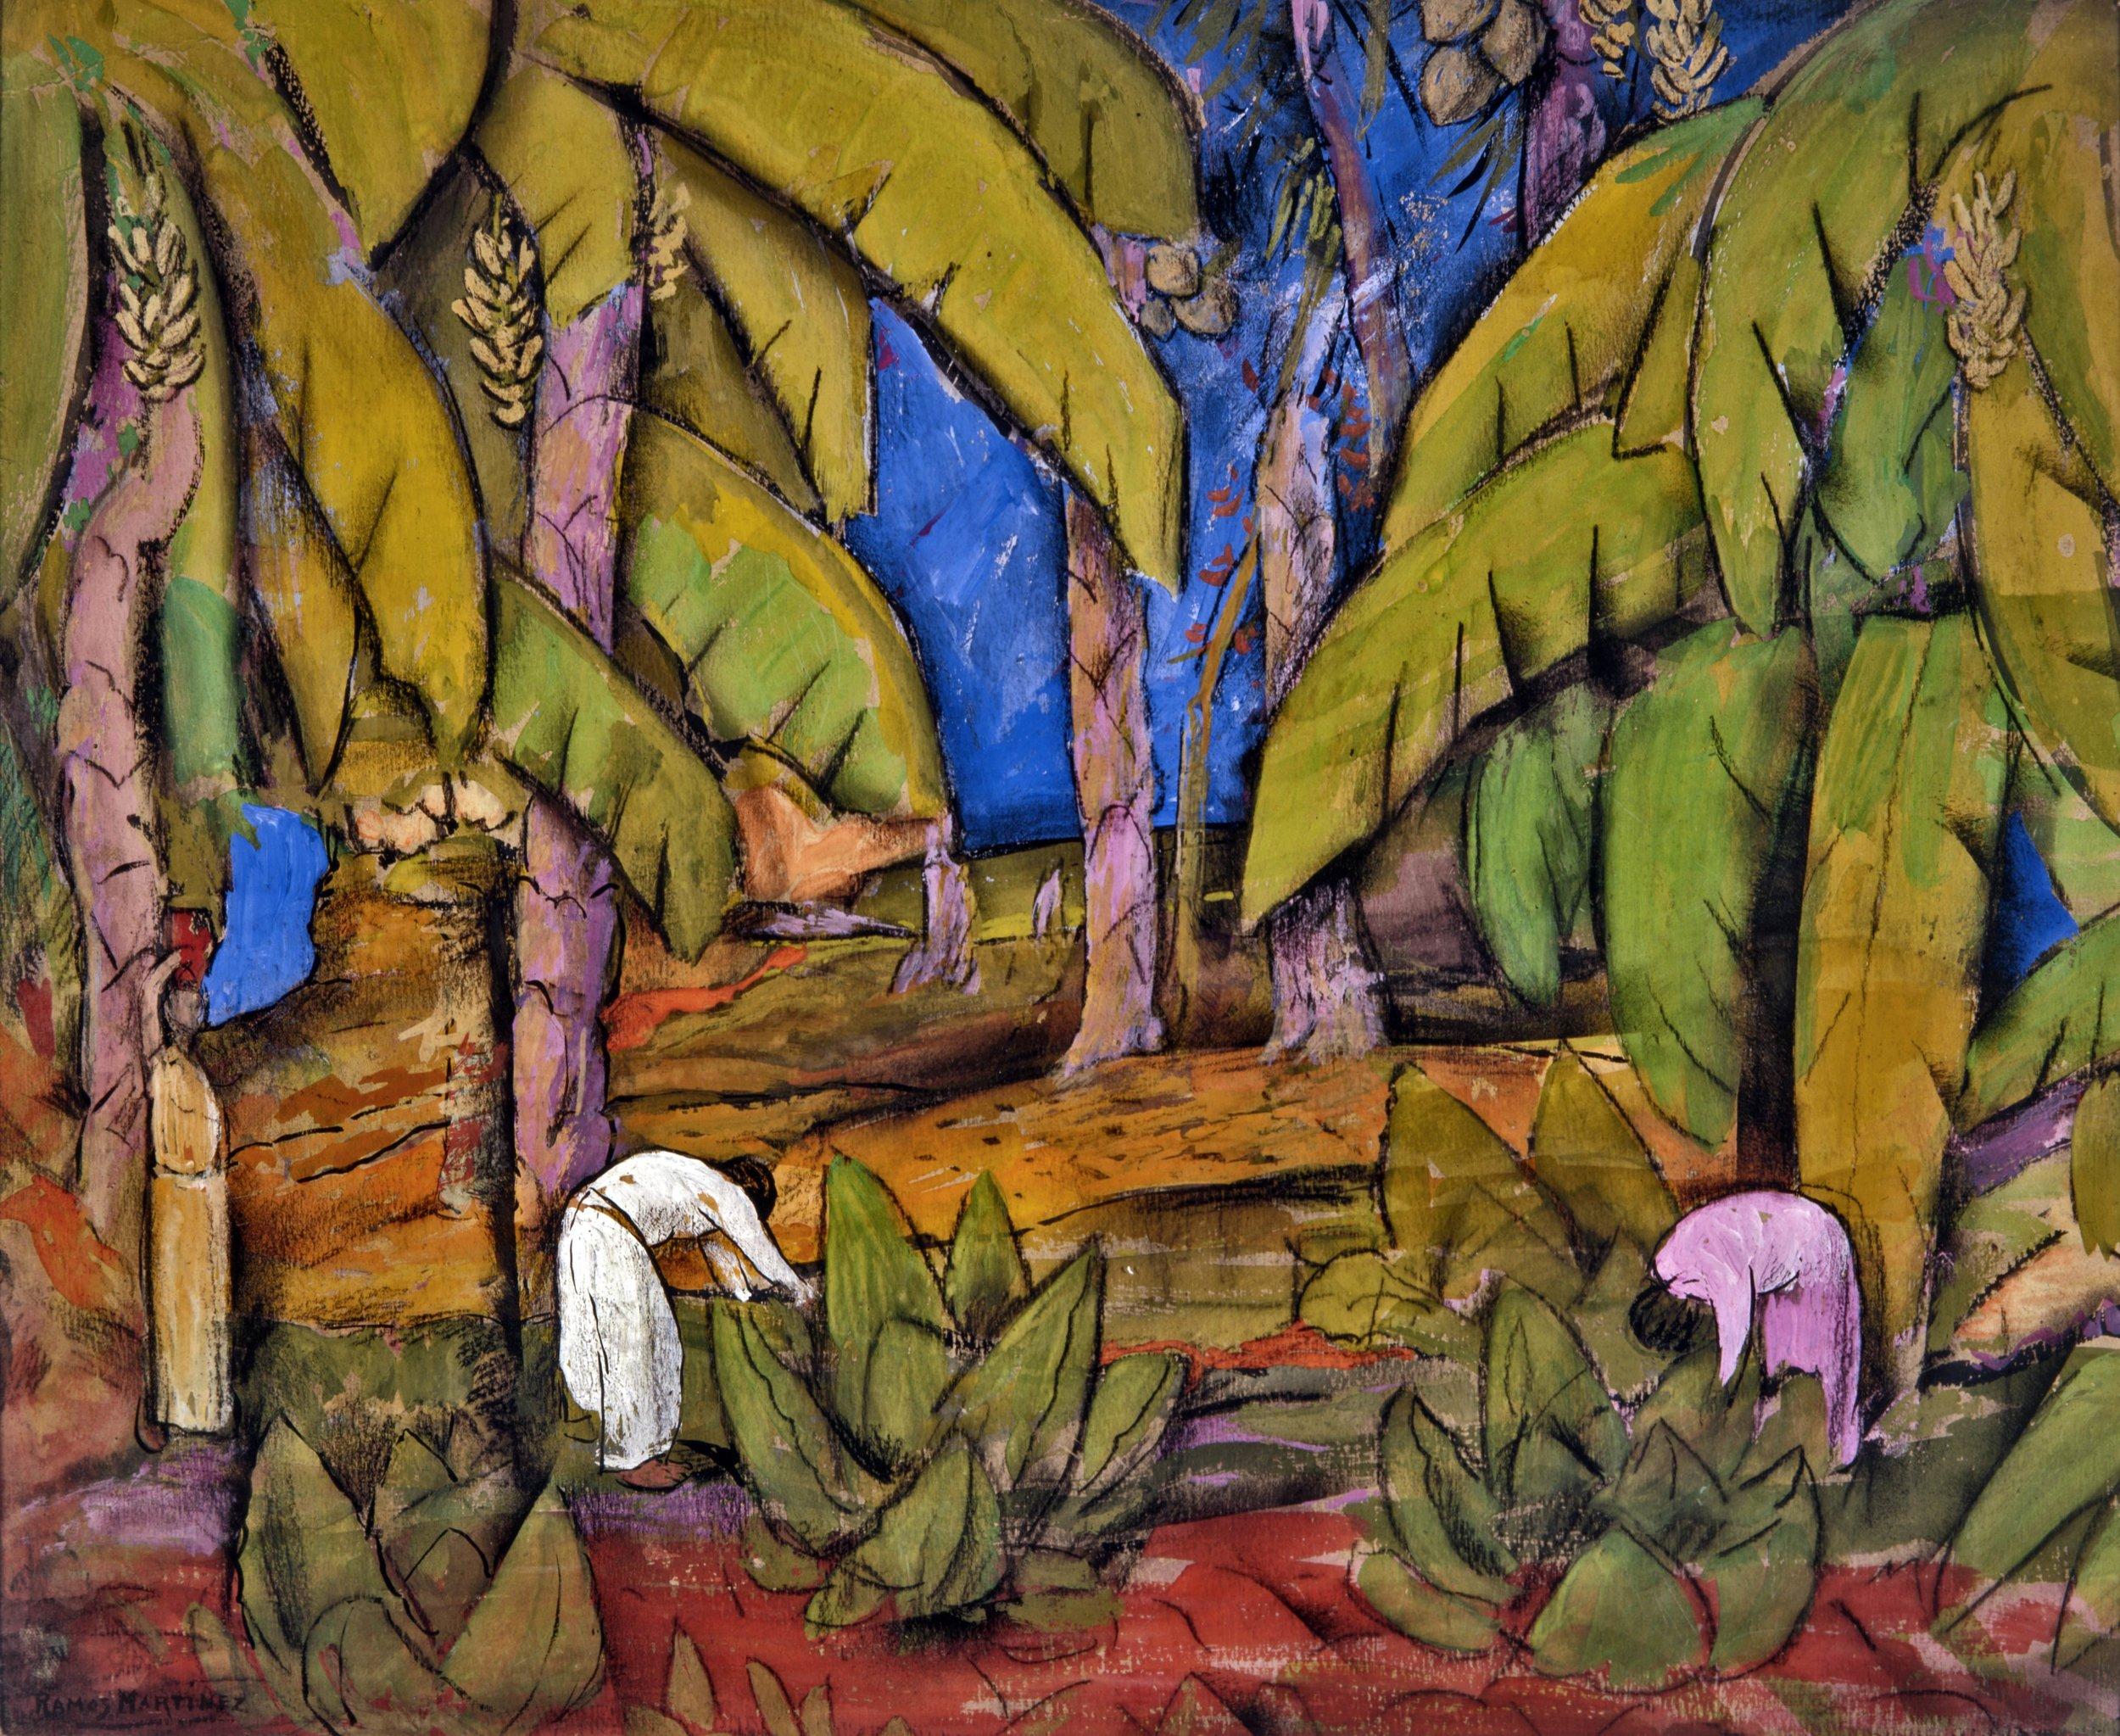 Platanal / Banana Plantation  ca. 1939 tempera, pastel and charcoal on paper / temple, pintura al pastel y carbón sobre papel 18 x 22 inches; 45.7 x 55.9 centímetros Private collection